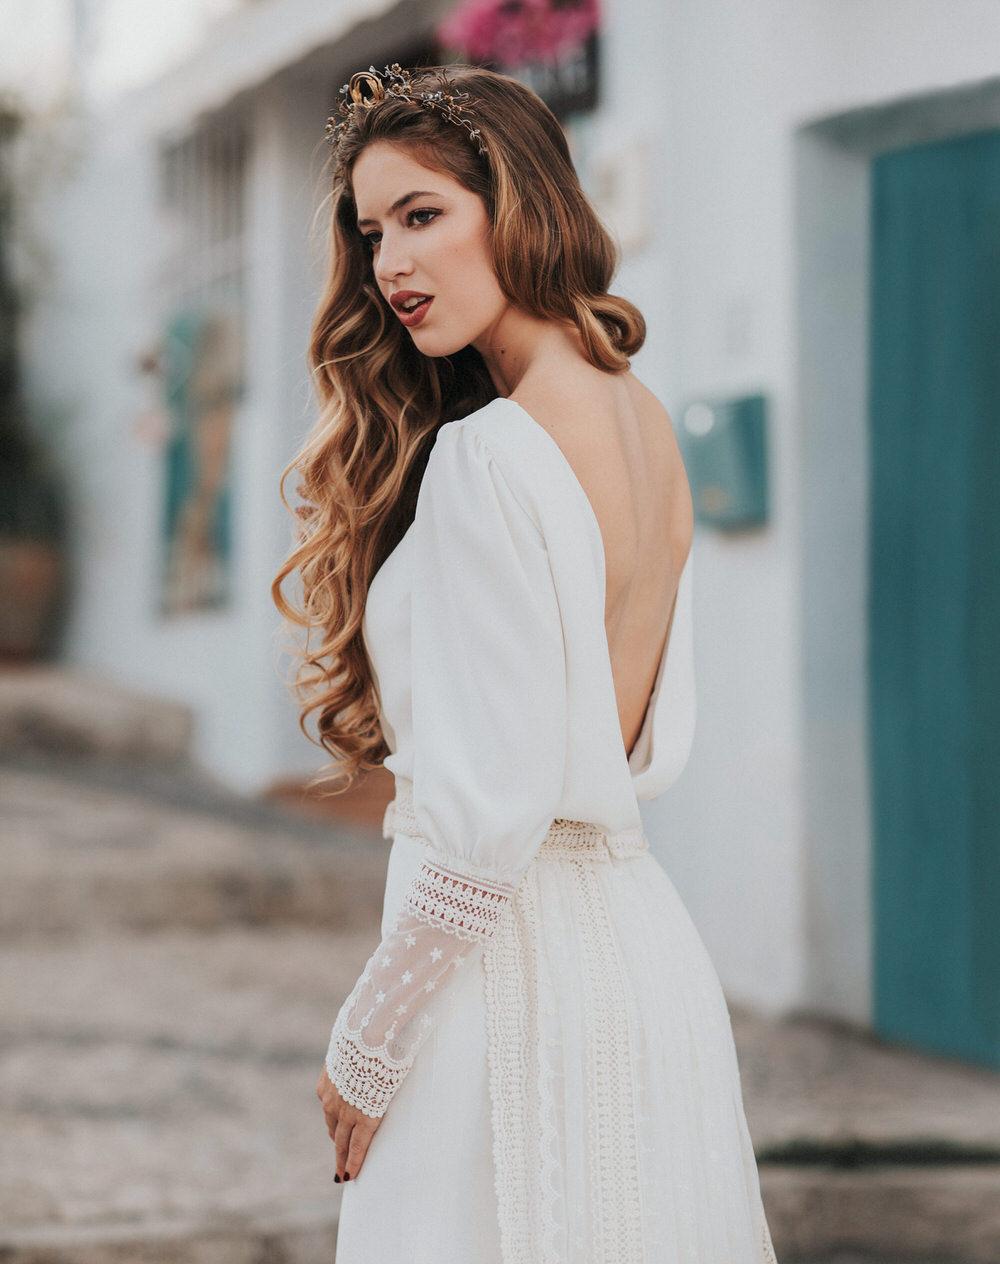 Bridal_CMesa_web-5.jpg